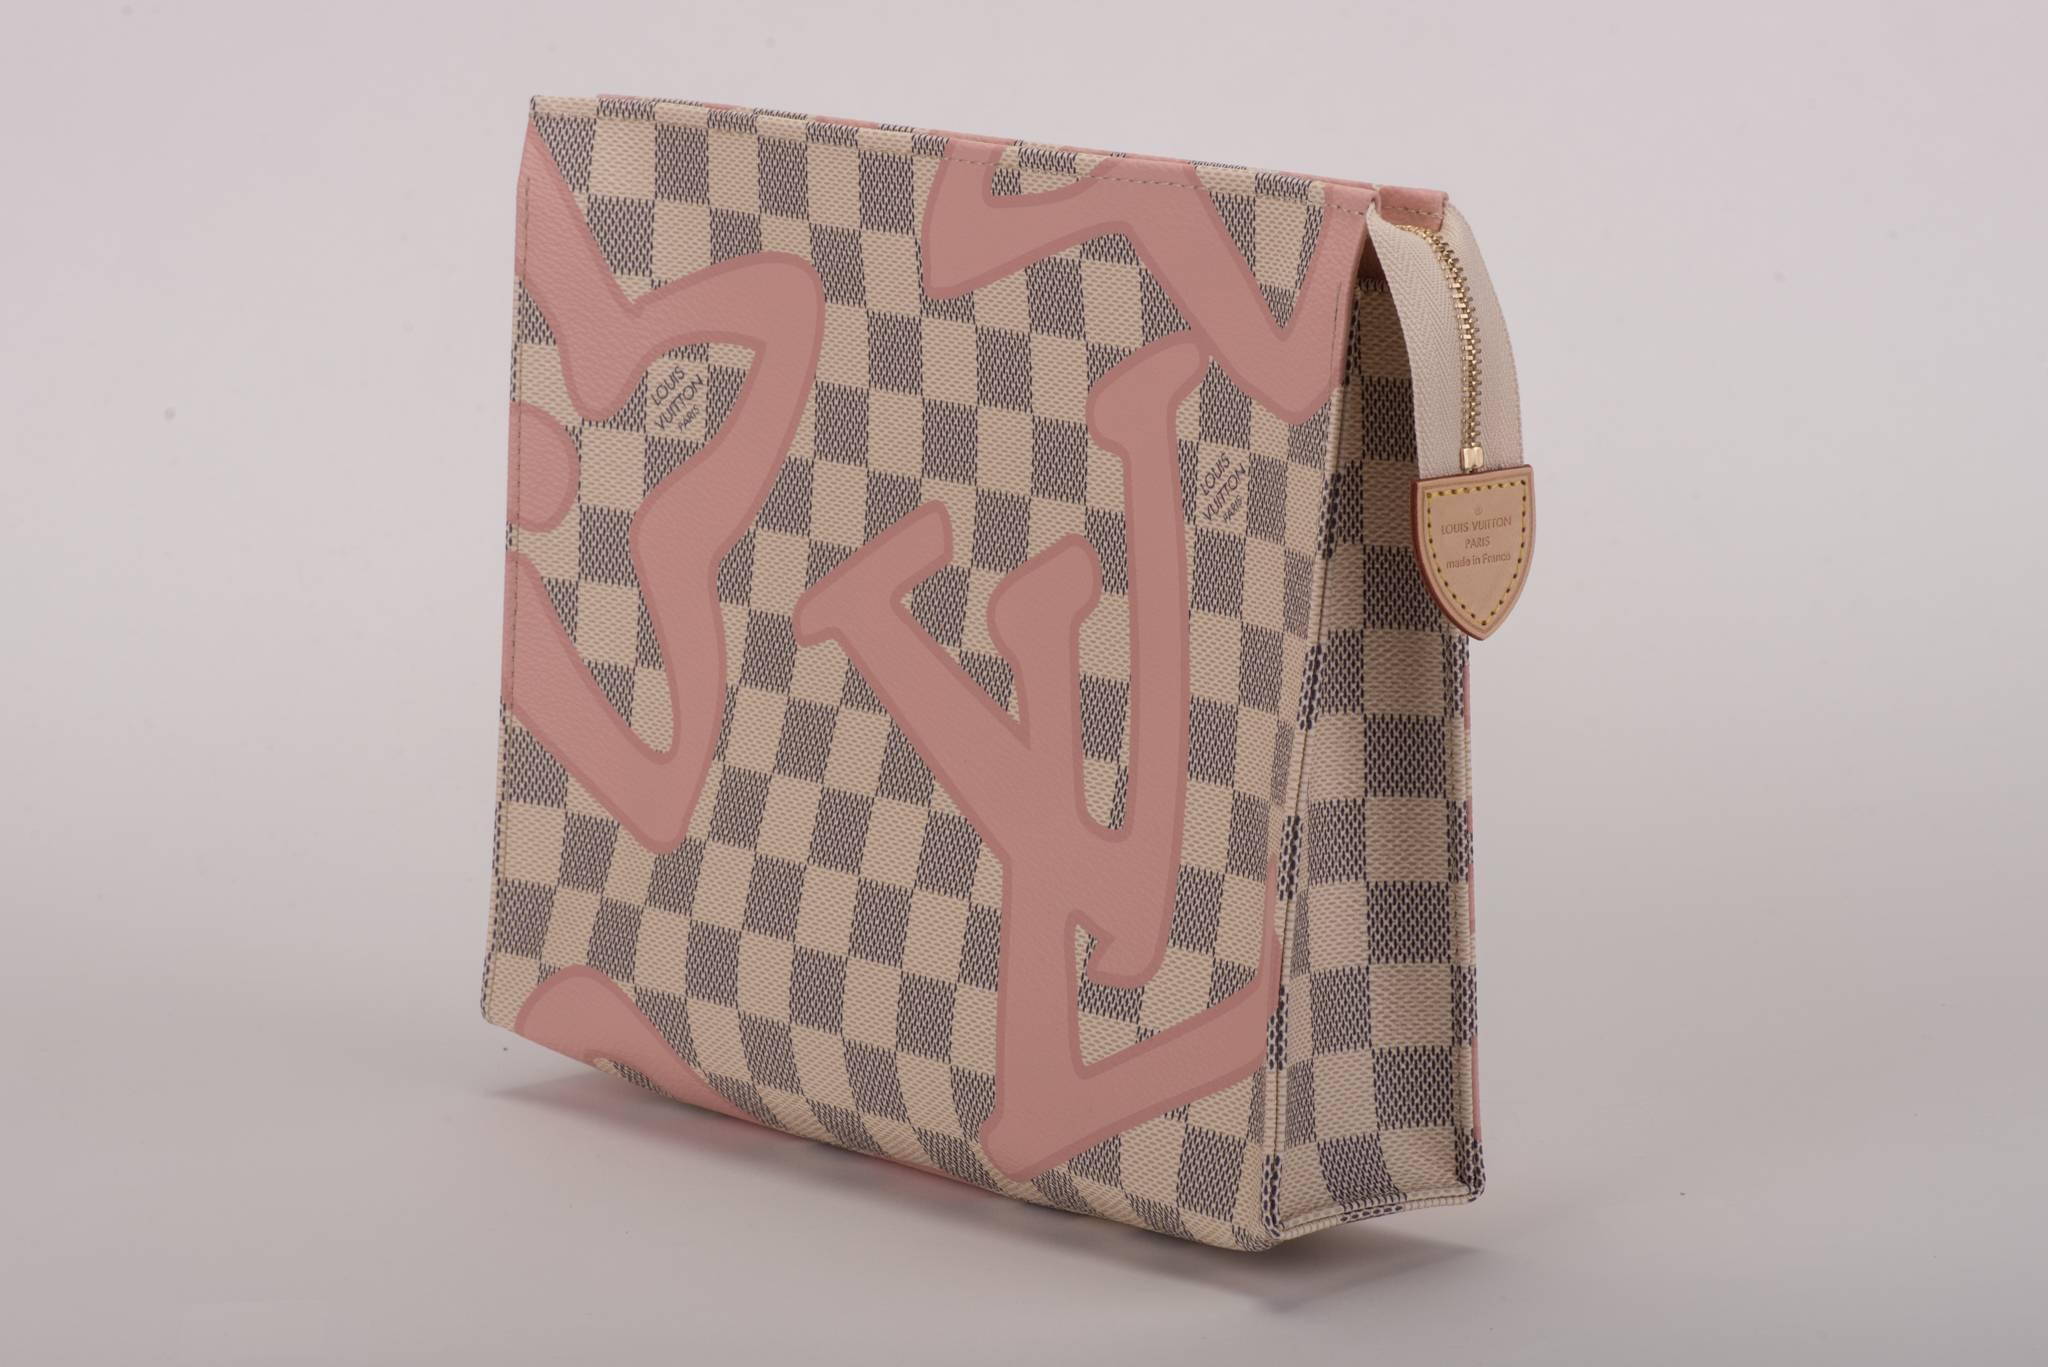 Louis Vuitton Limited Edition Tahiti Damier Pouchette gBbJ1tiGe